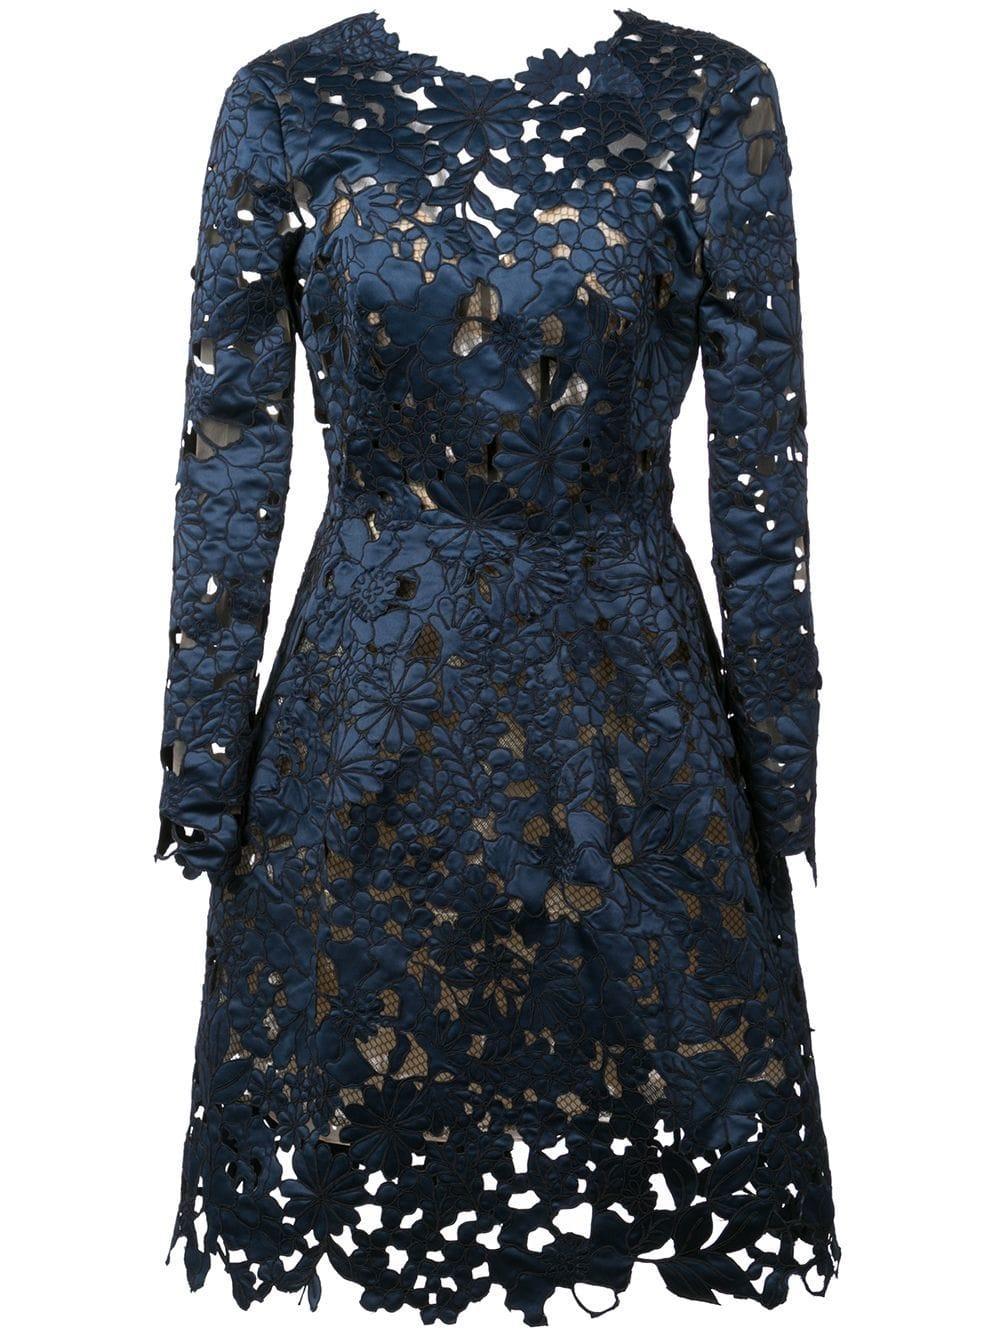 Longsleeve Lace Cocktail Dress